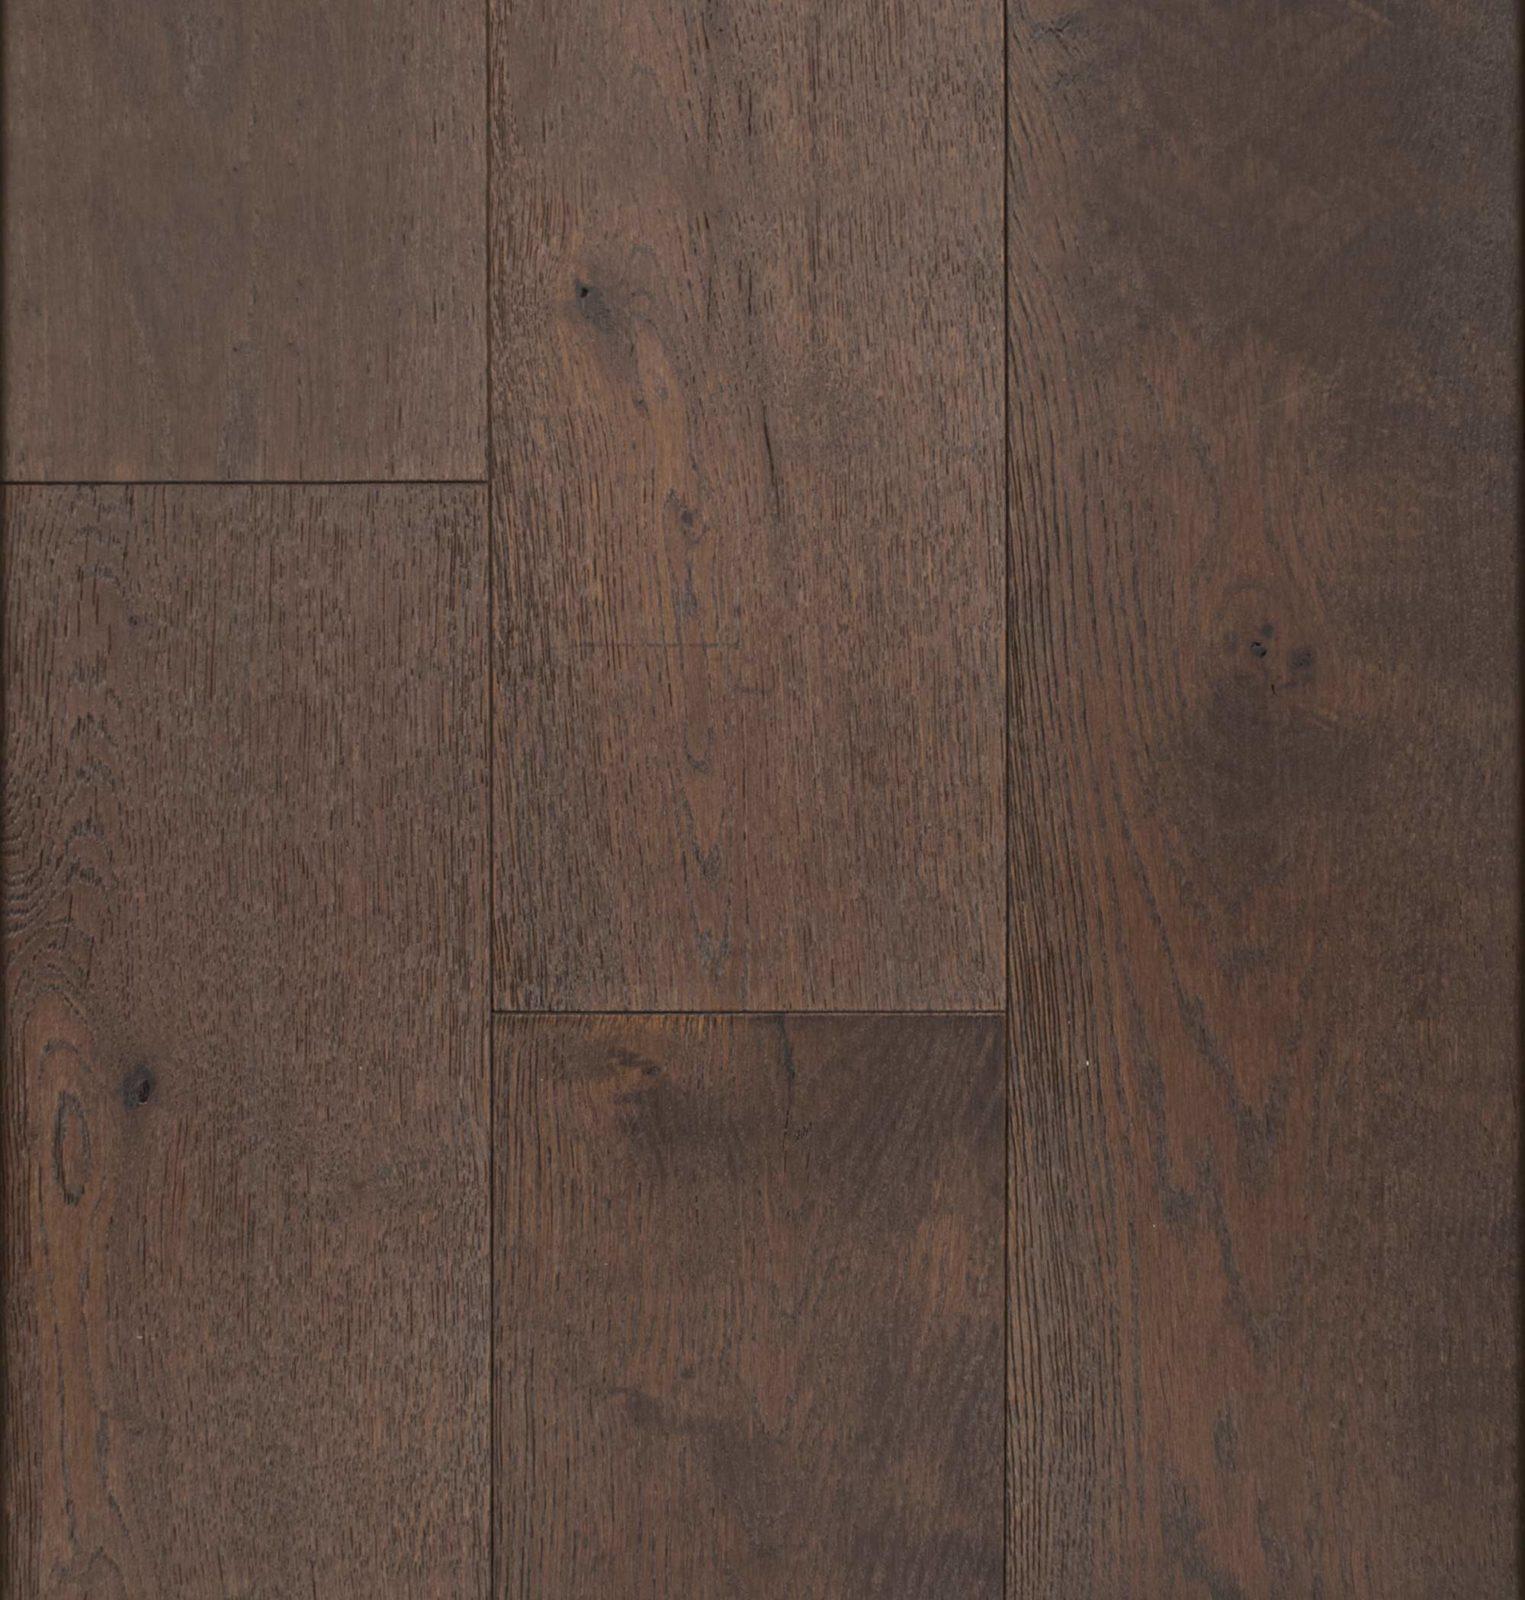 Making Hand Scraped Hardwood Floors Shine Again : modena hardwood flooring